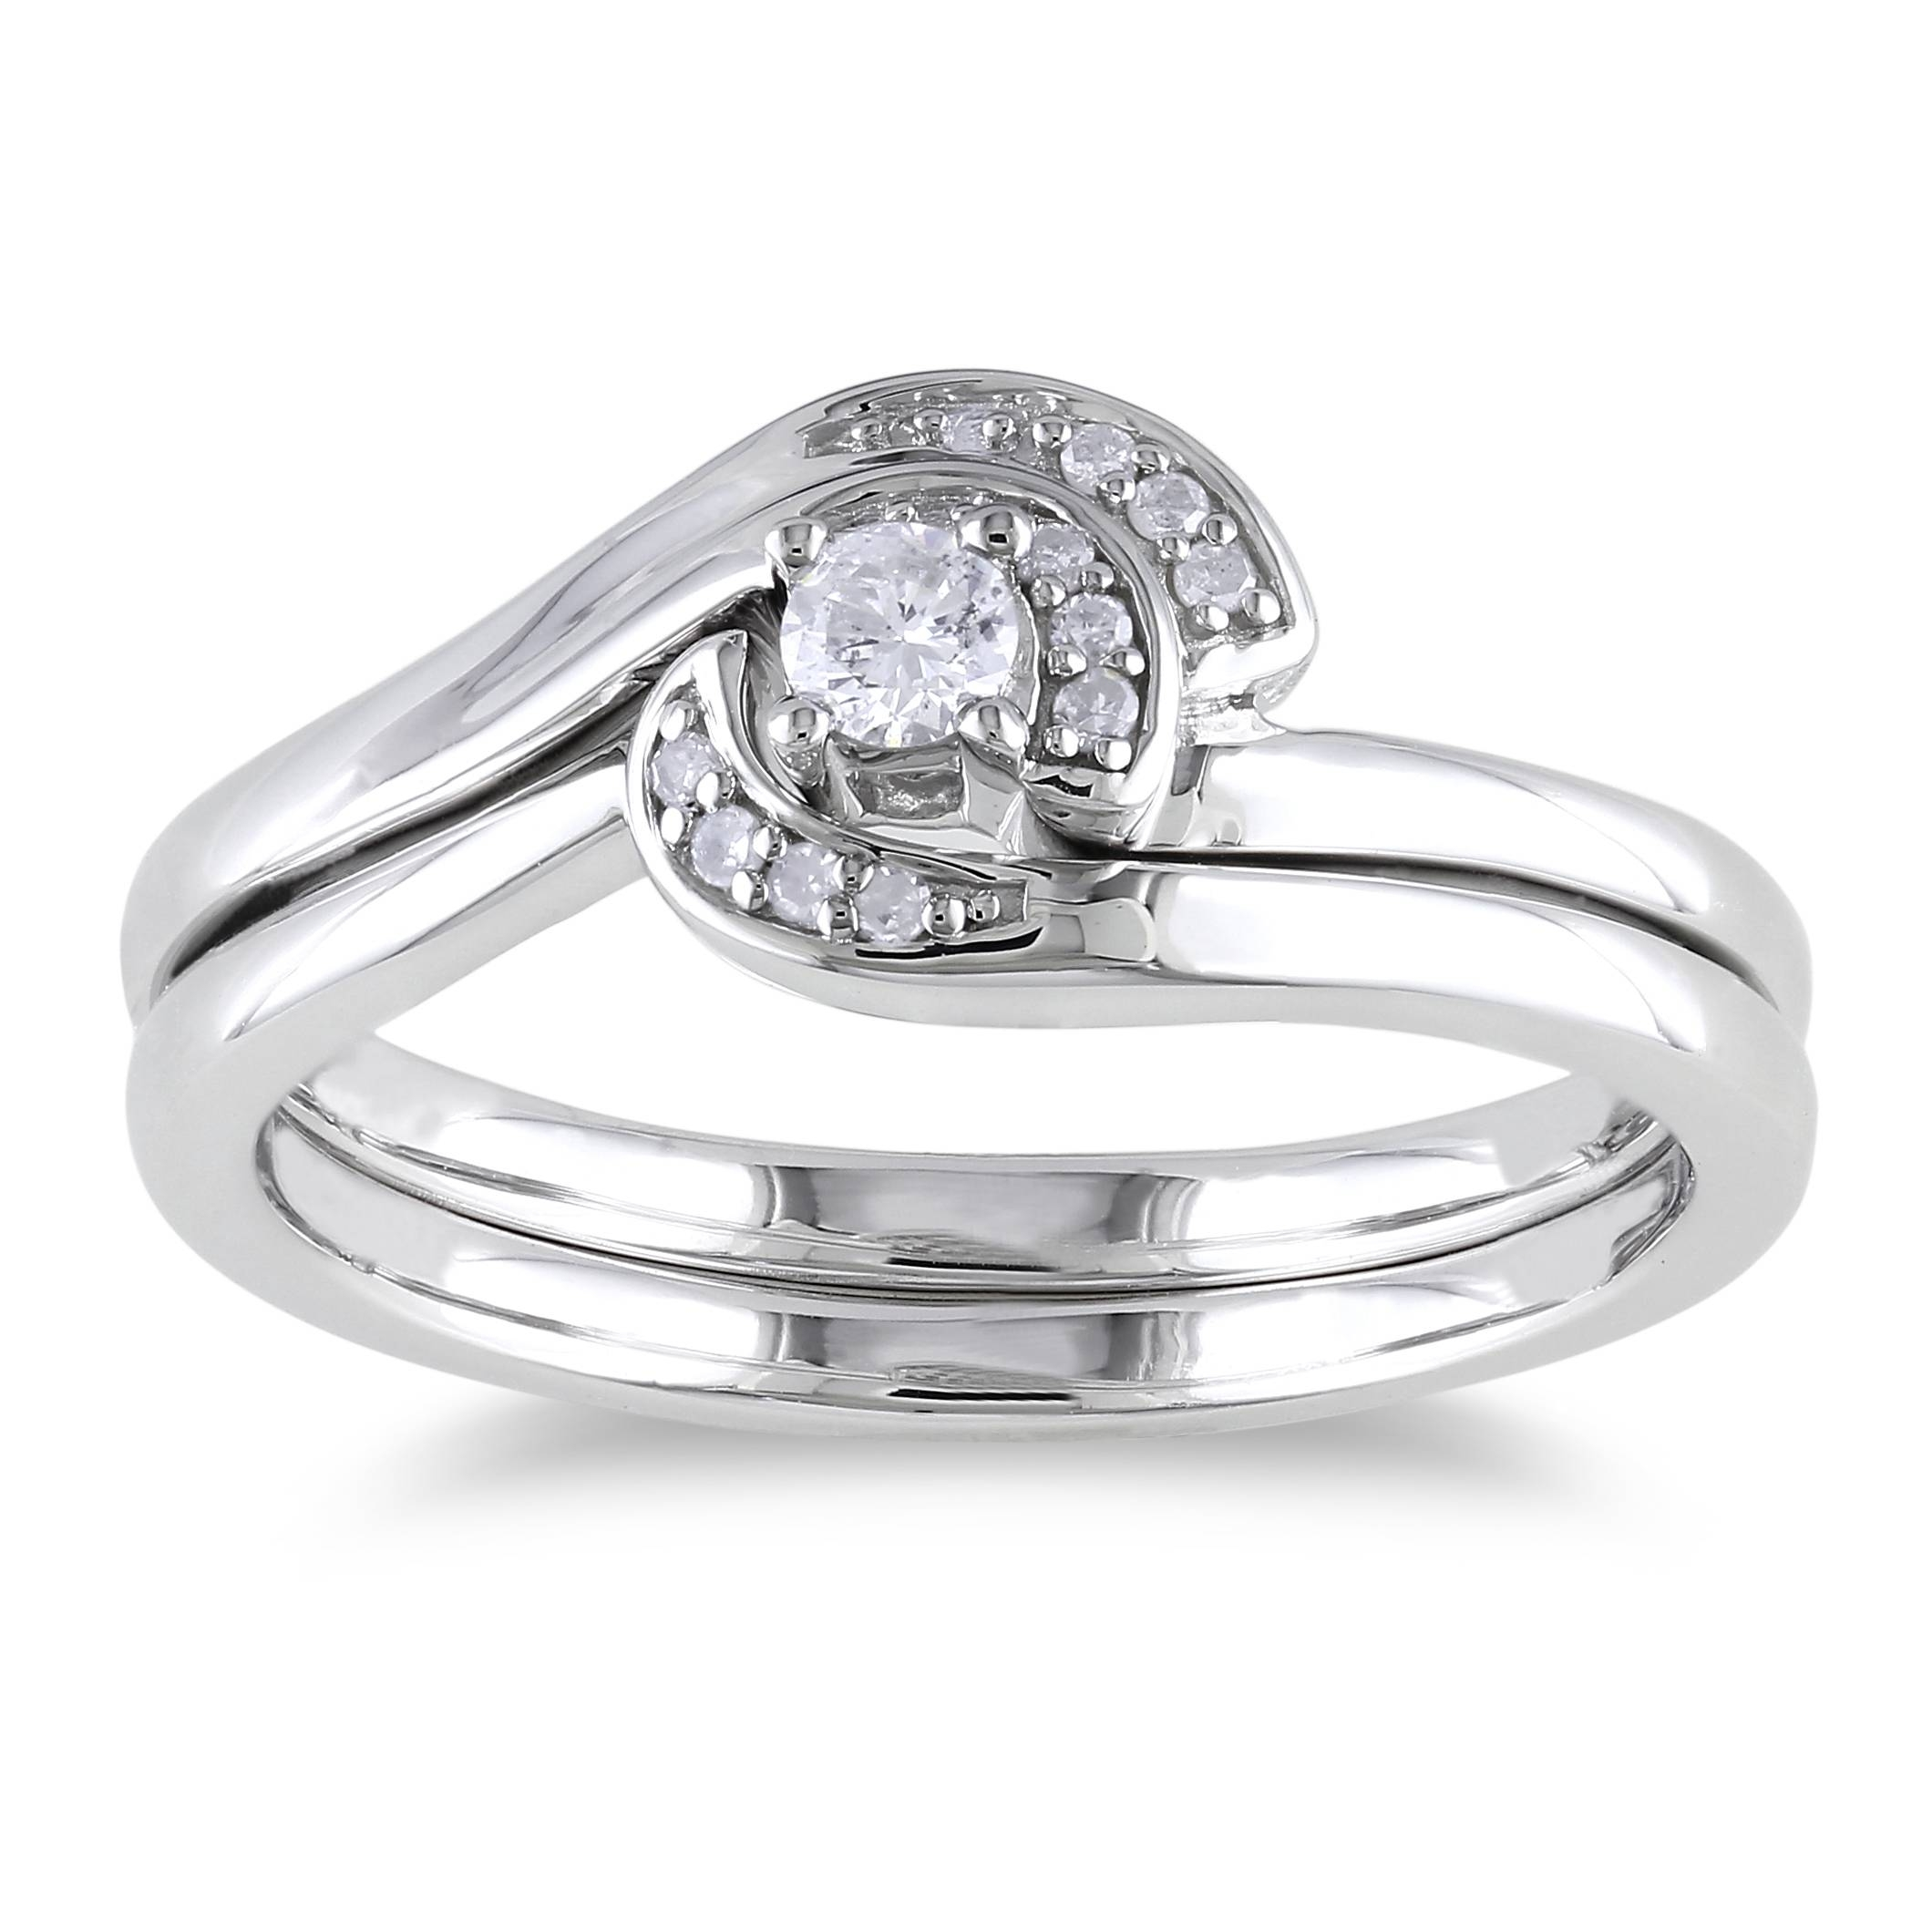 Silicone Wedding Ring  Amazoncom Online Shopping for